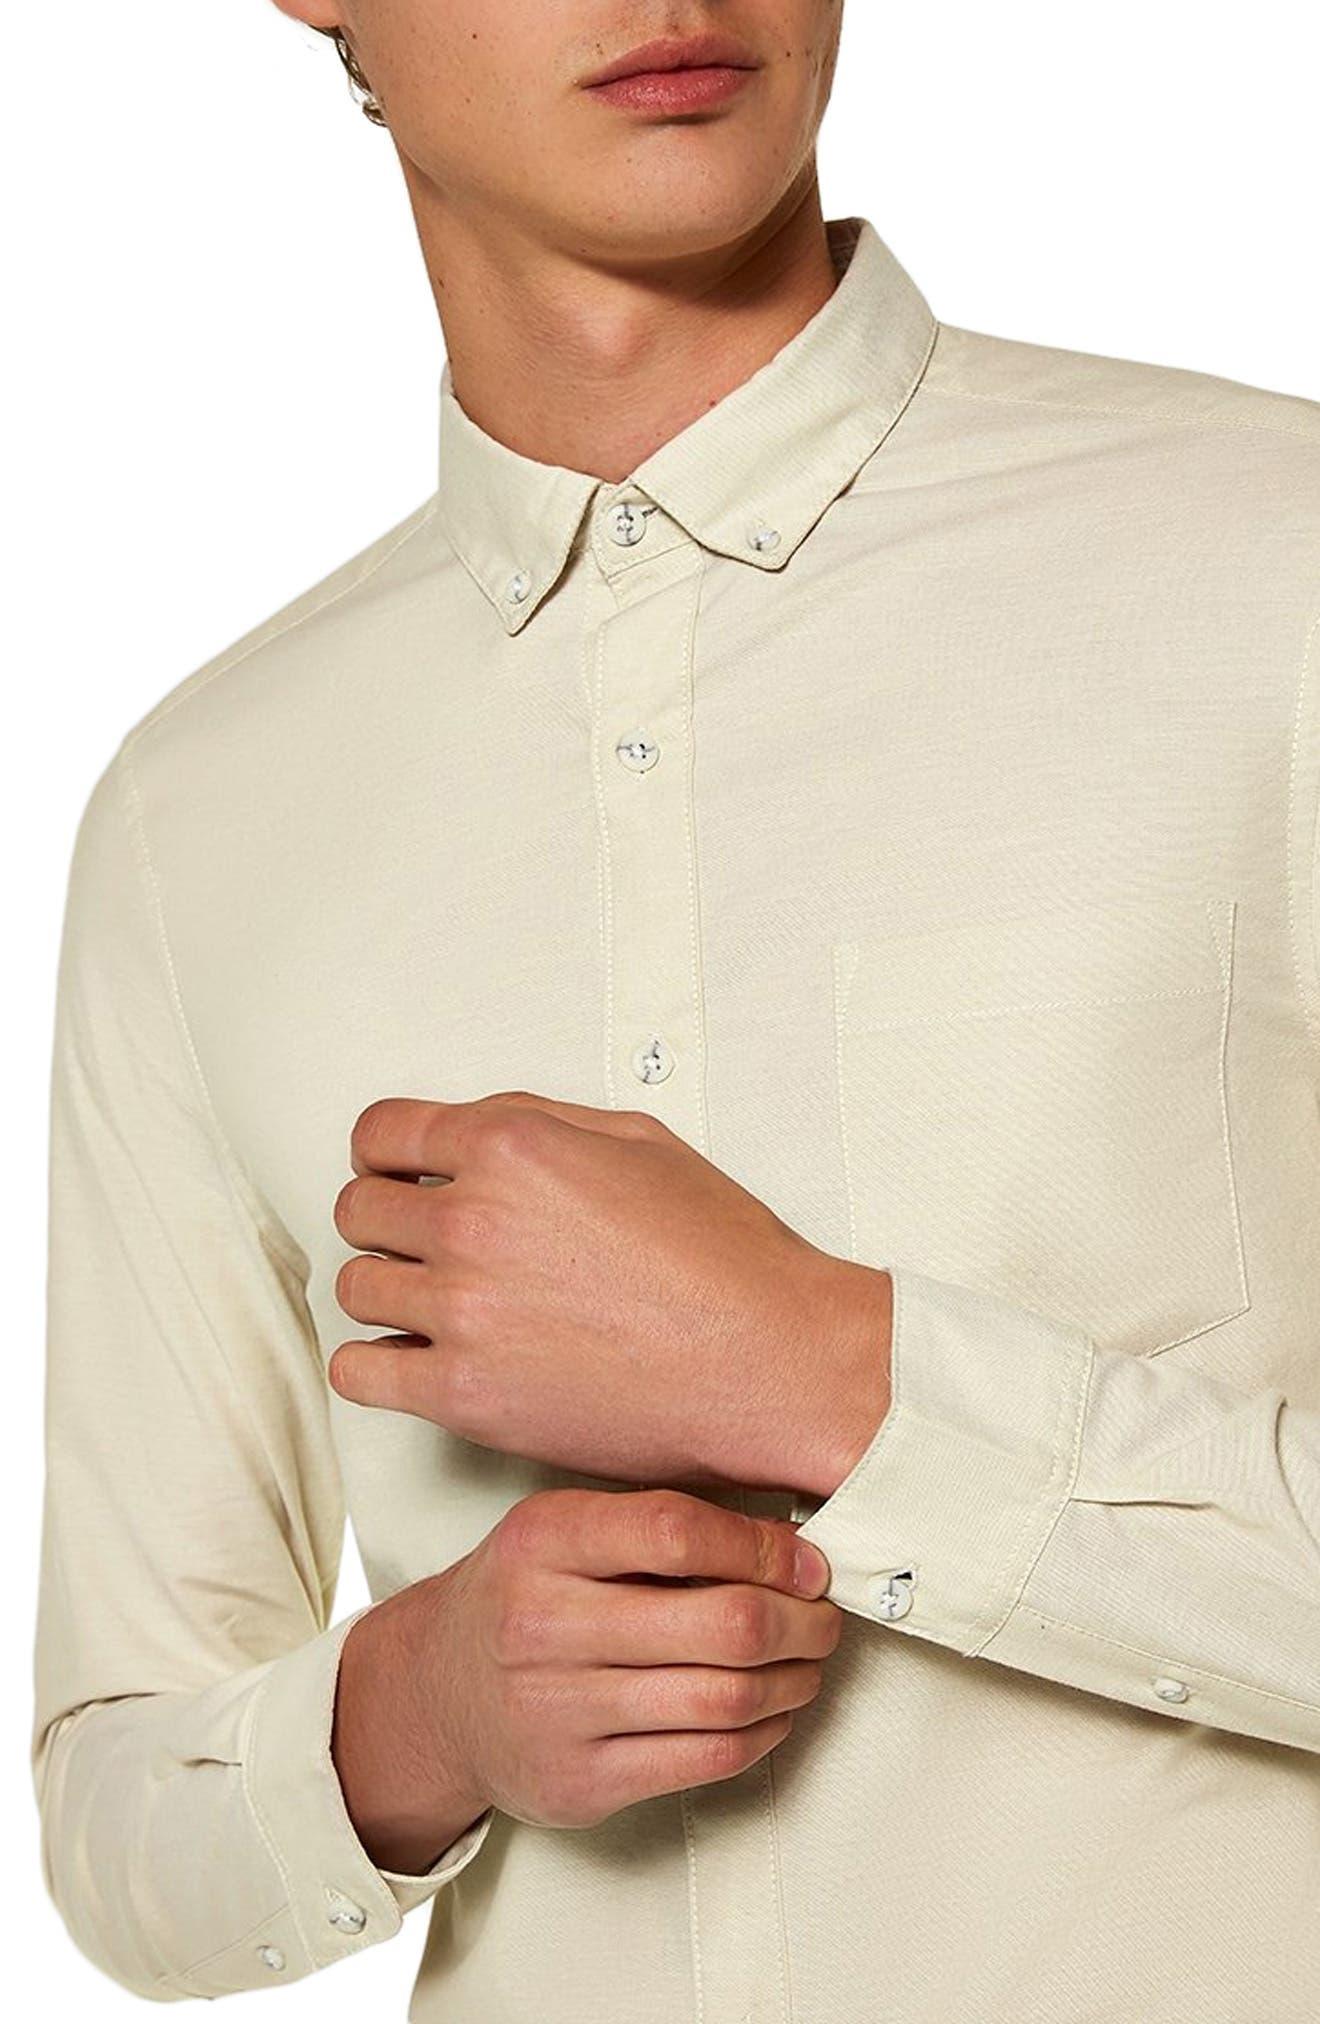 TOPMAN,                             Muscle Fit Stripe Oxford Shirt,                             Alternate thumbnail 2, color,                             250